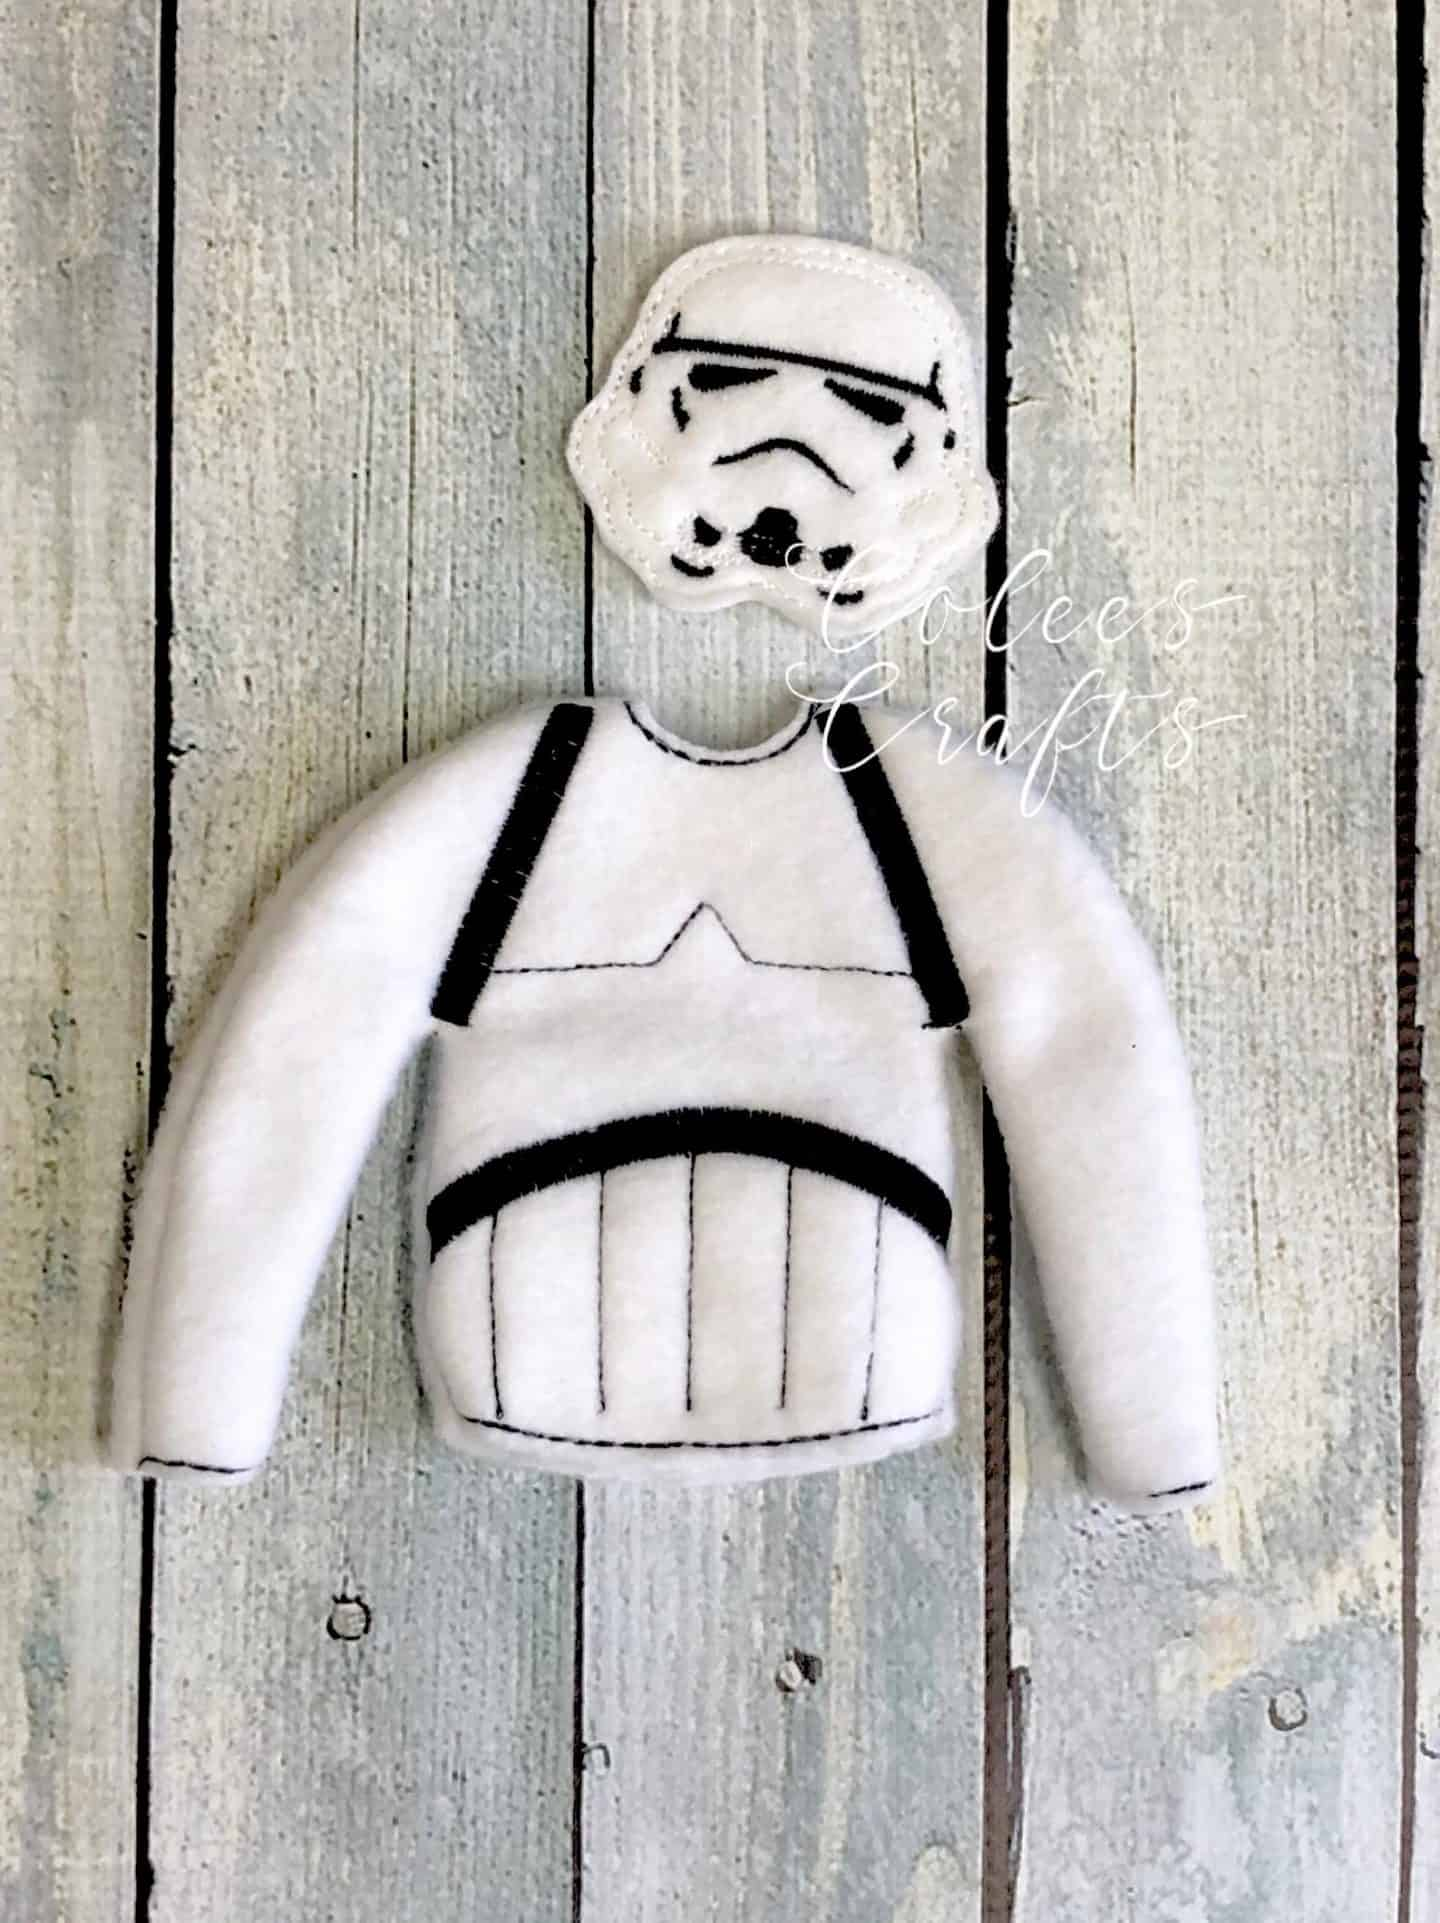 Star Wars Stormtrooper Elf on the Shelf